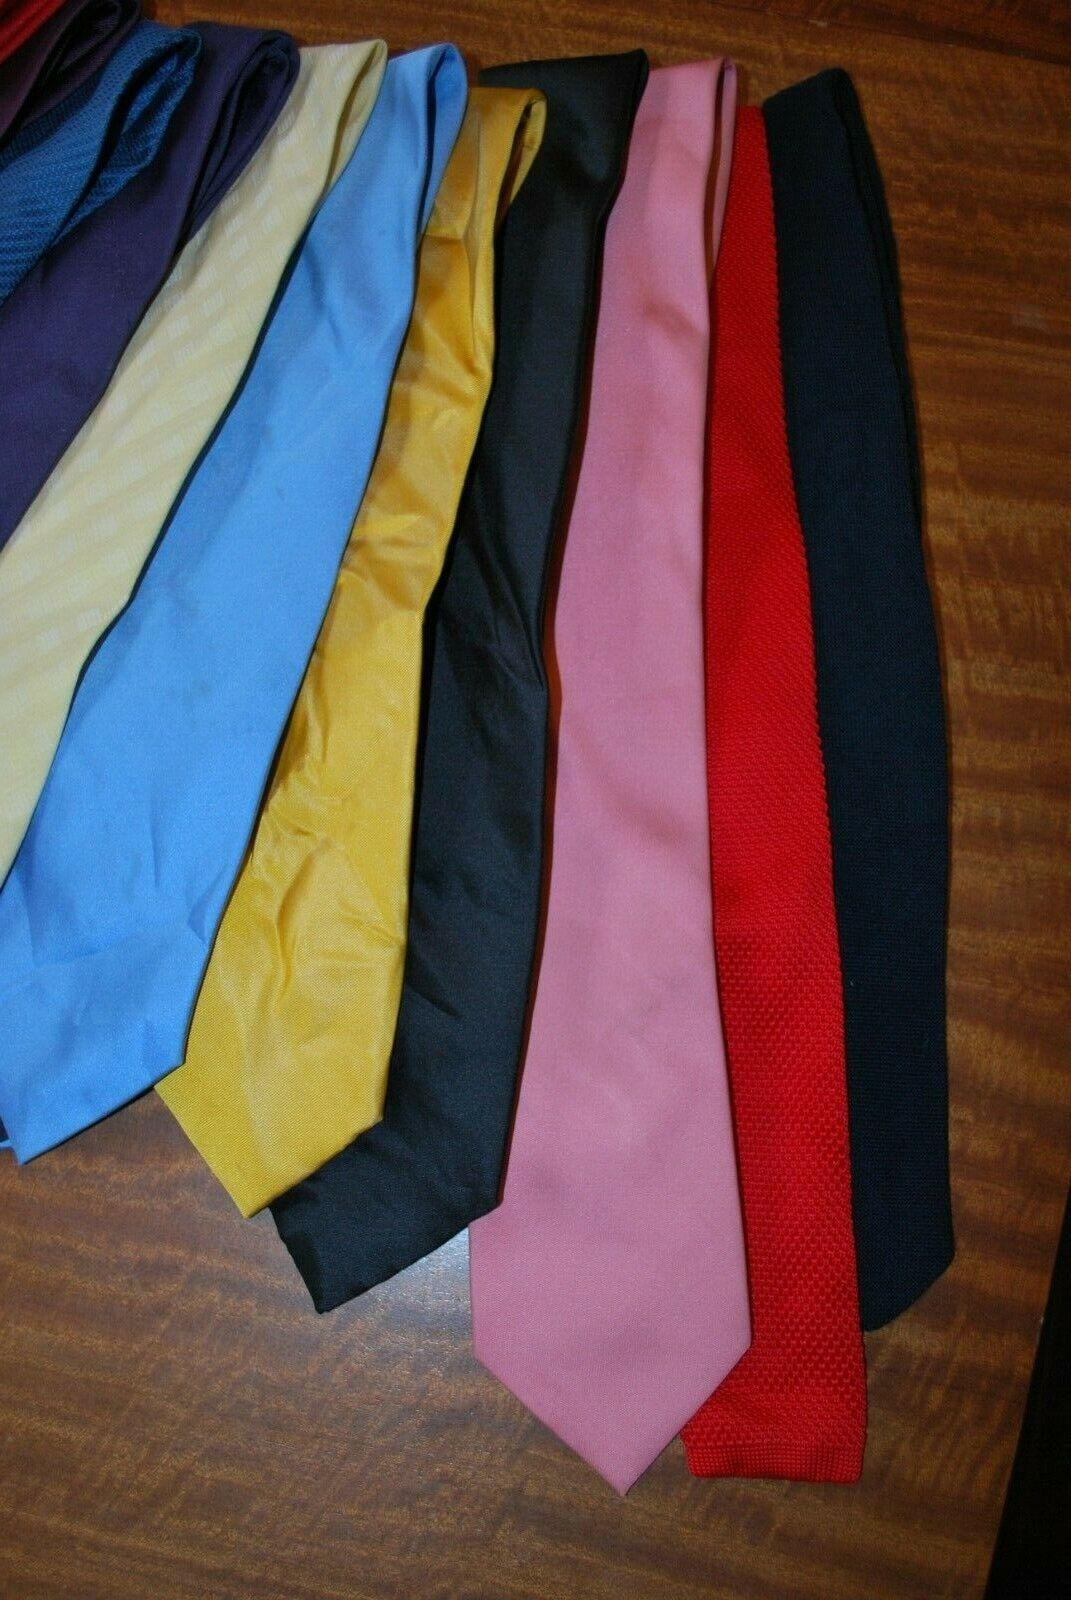 15 x various coloured Tie's job lot bulk buy 7